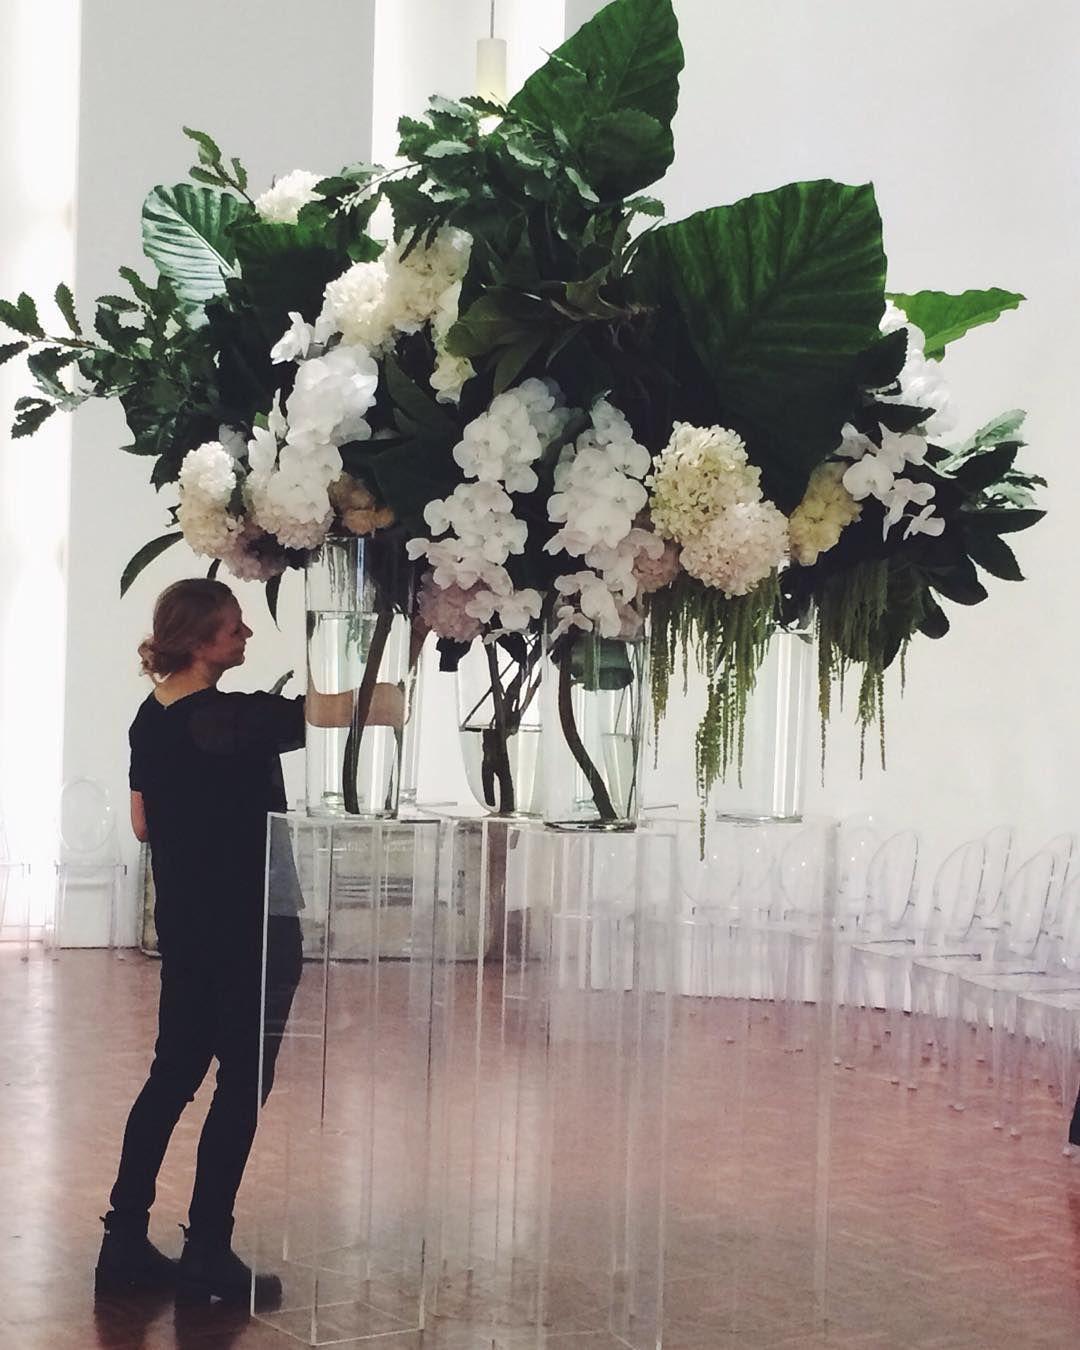 Imagina recibir a tus invitados con estos arreglos a escala por Saskia Havekes, despampanante!